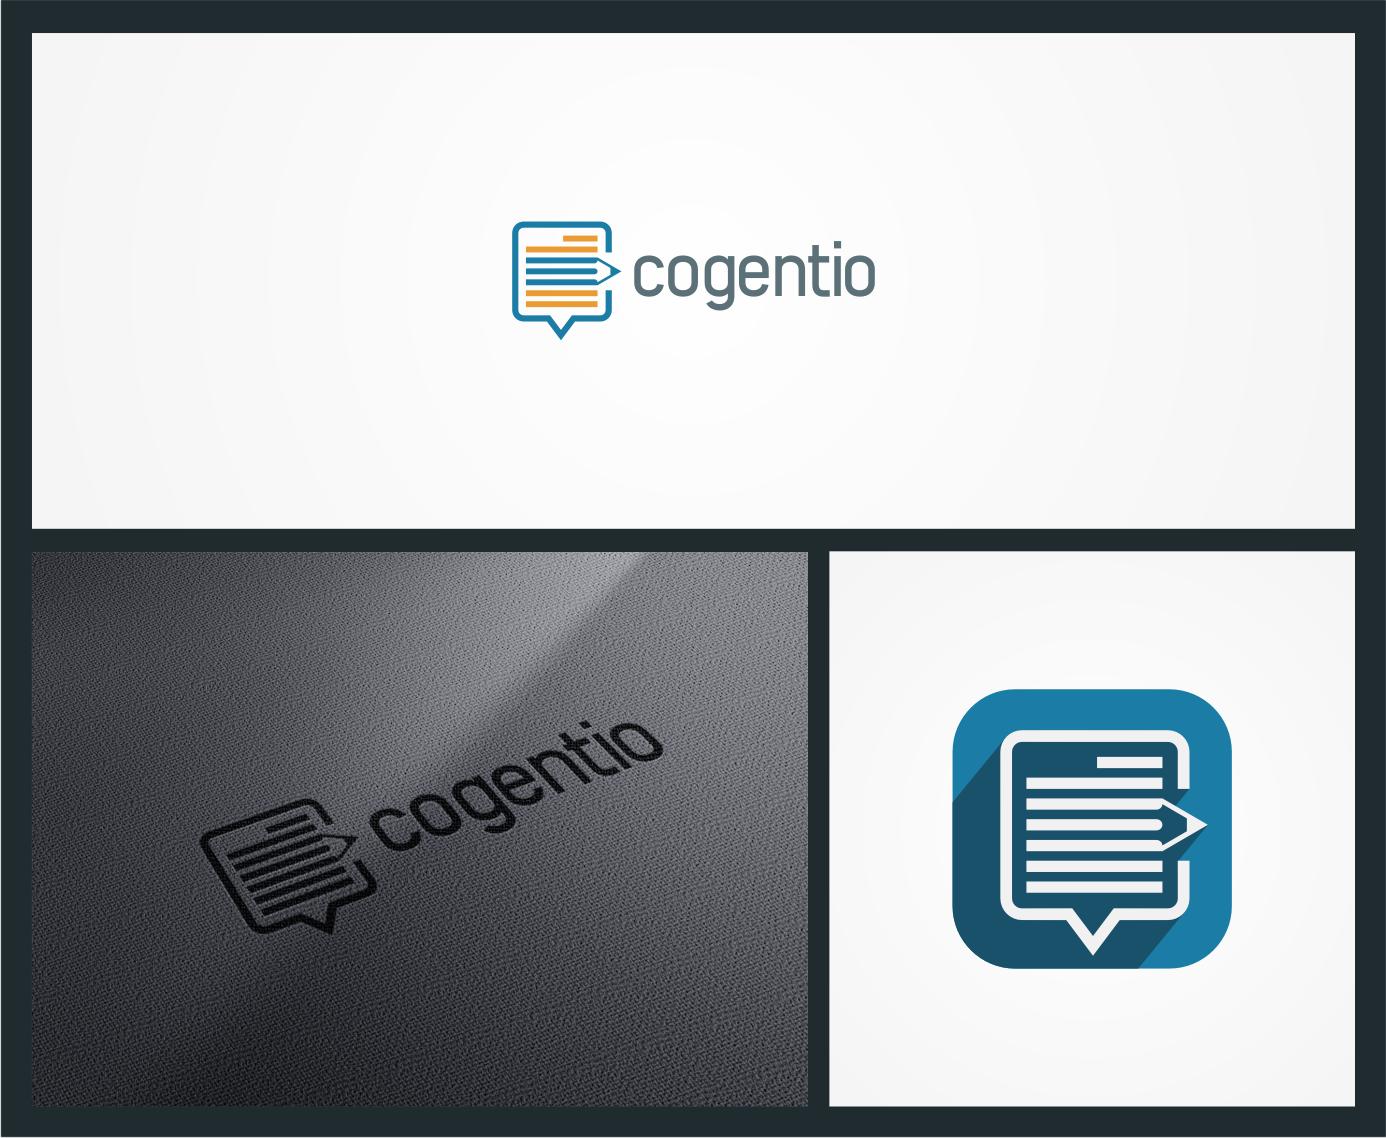 Create an inaugural corporate logo for Cogentio, a SaaS database